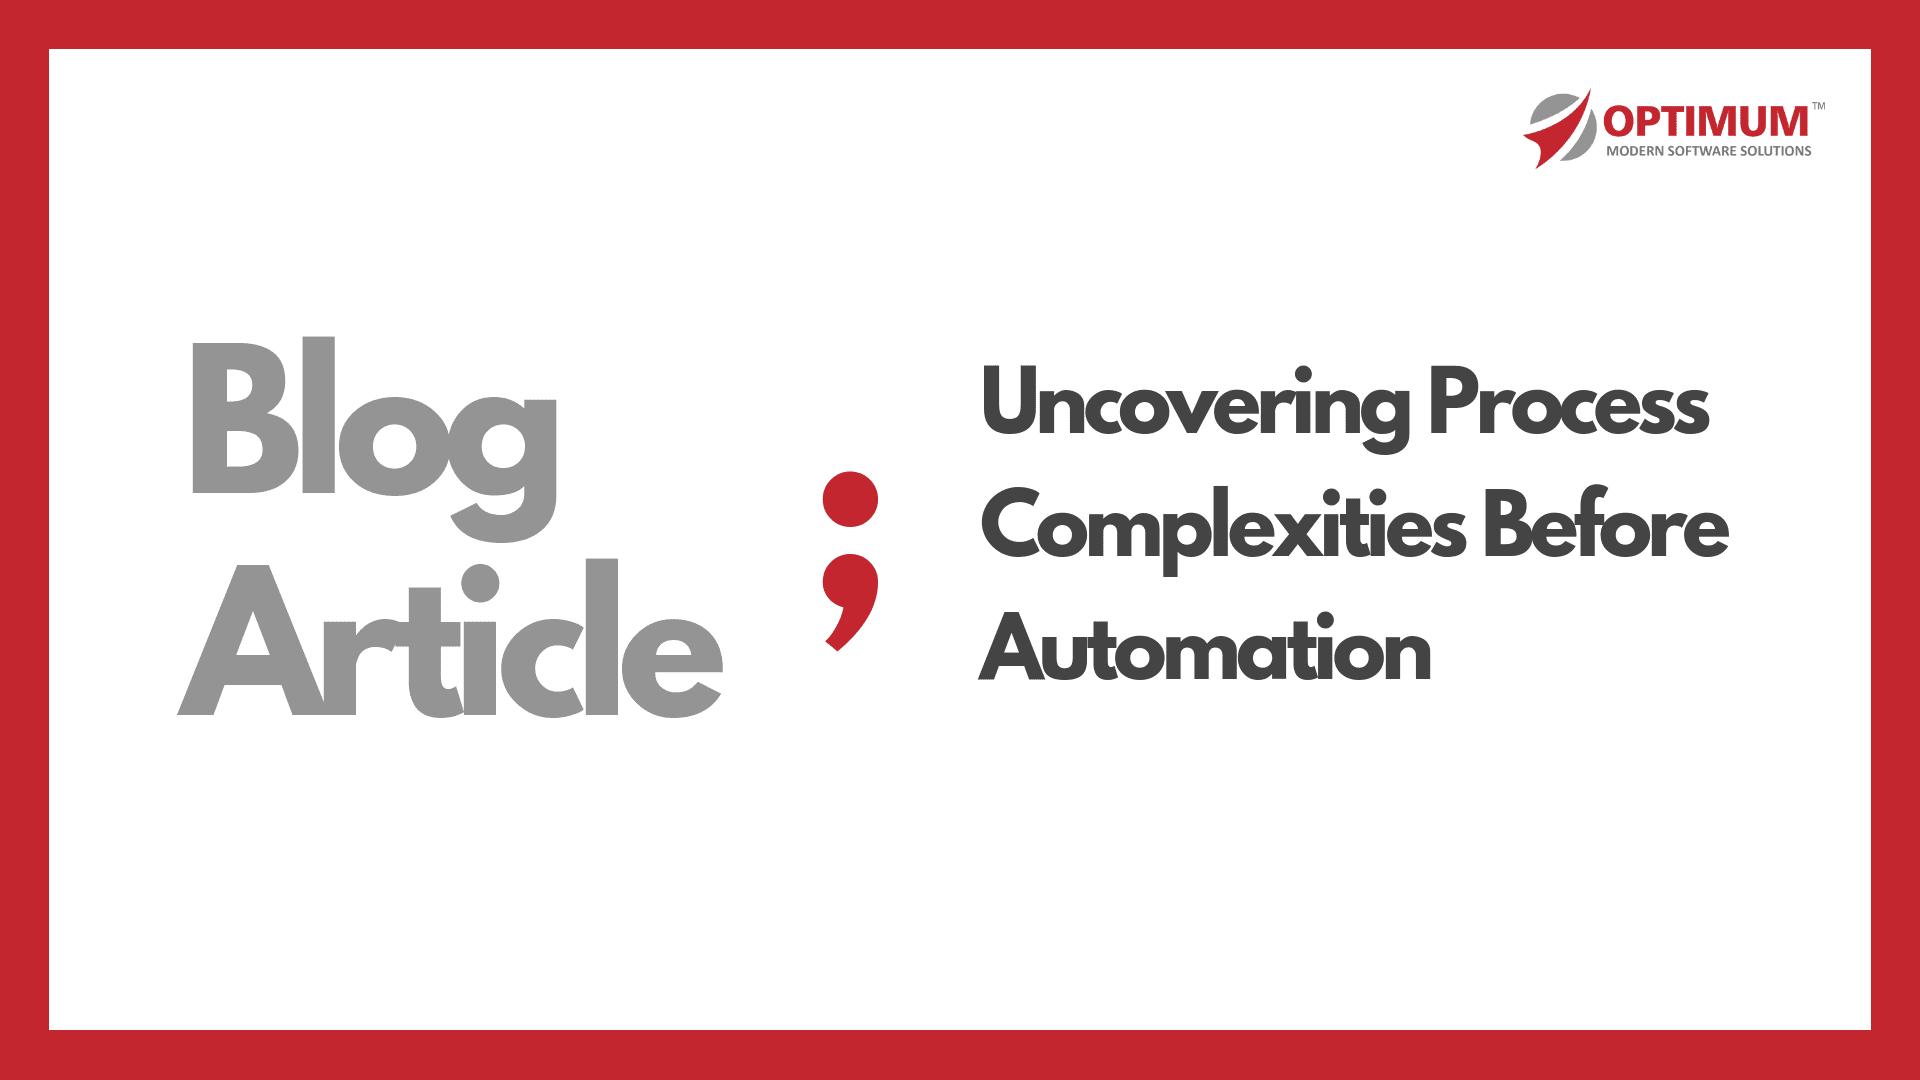 Optimum Process Automation Blog Article